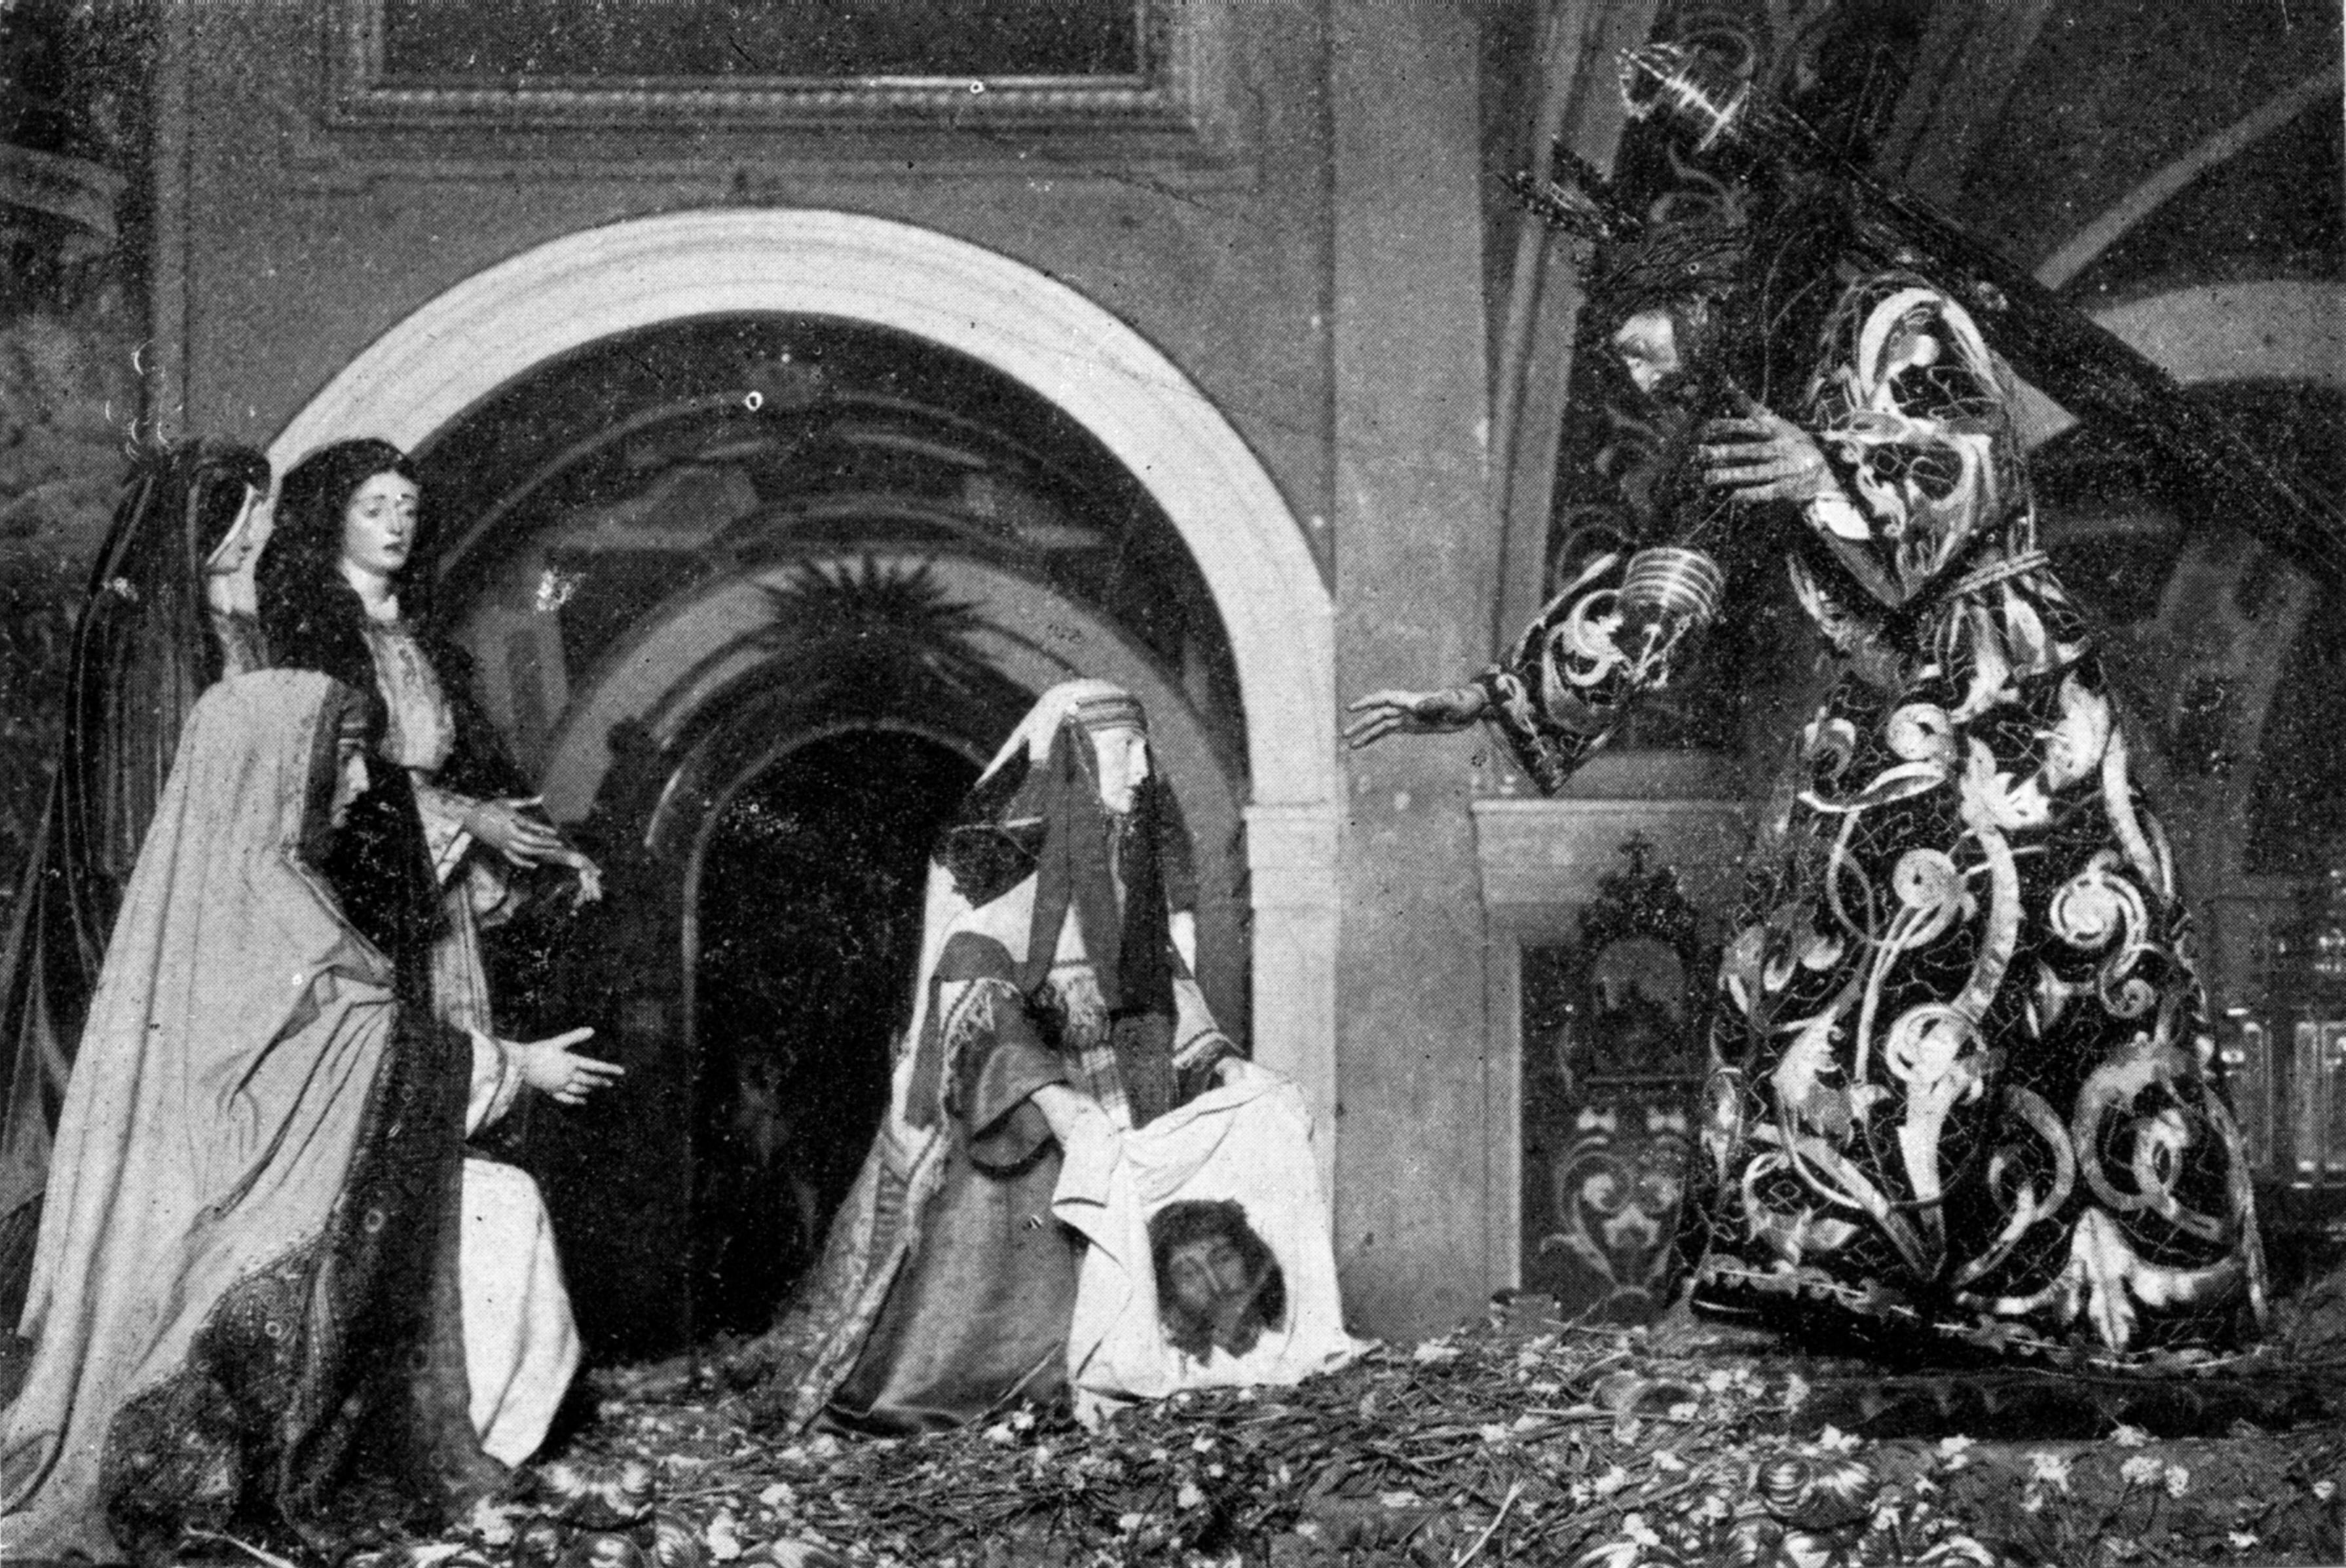 Misterio de la Calle de la Amargura, Jesús con la Cruz al Hombro